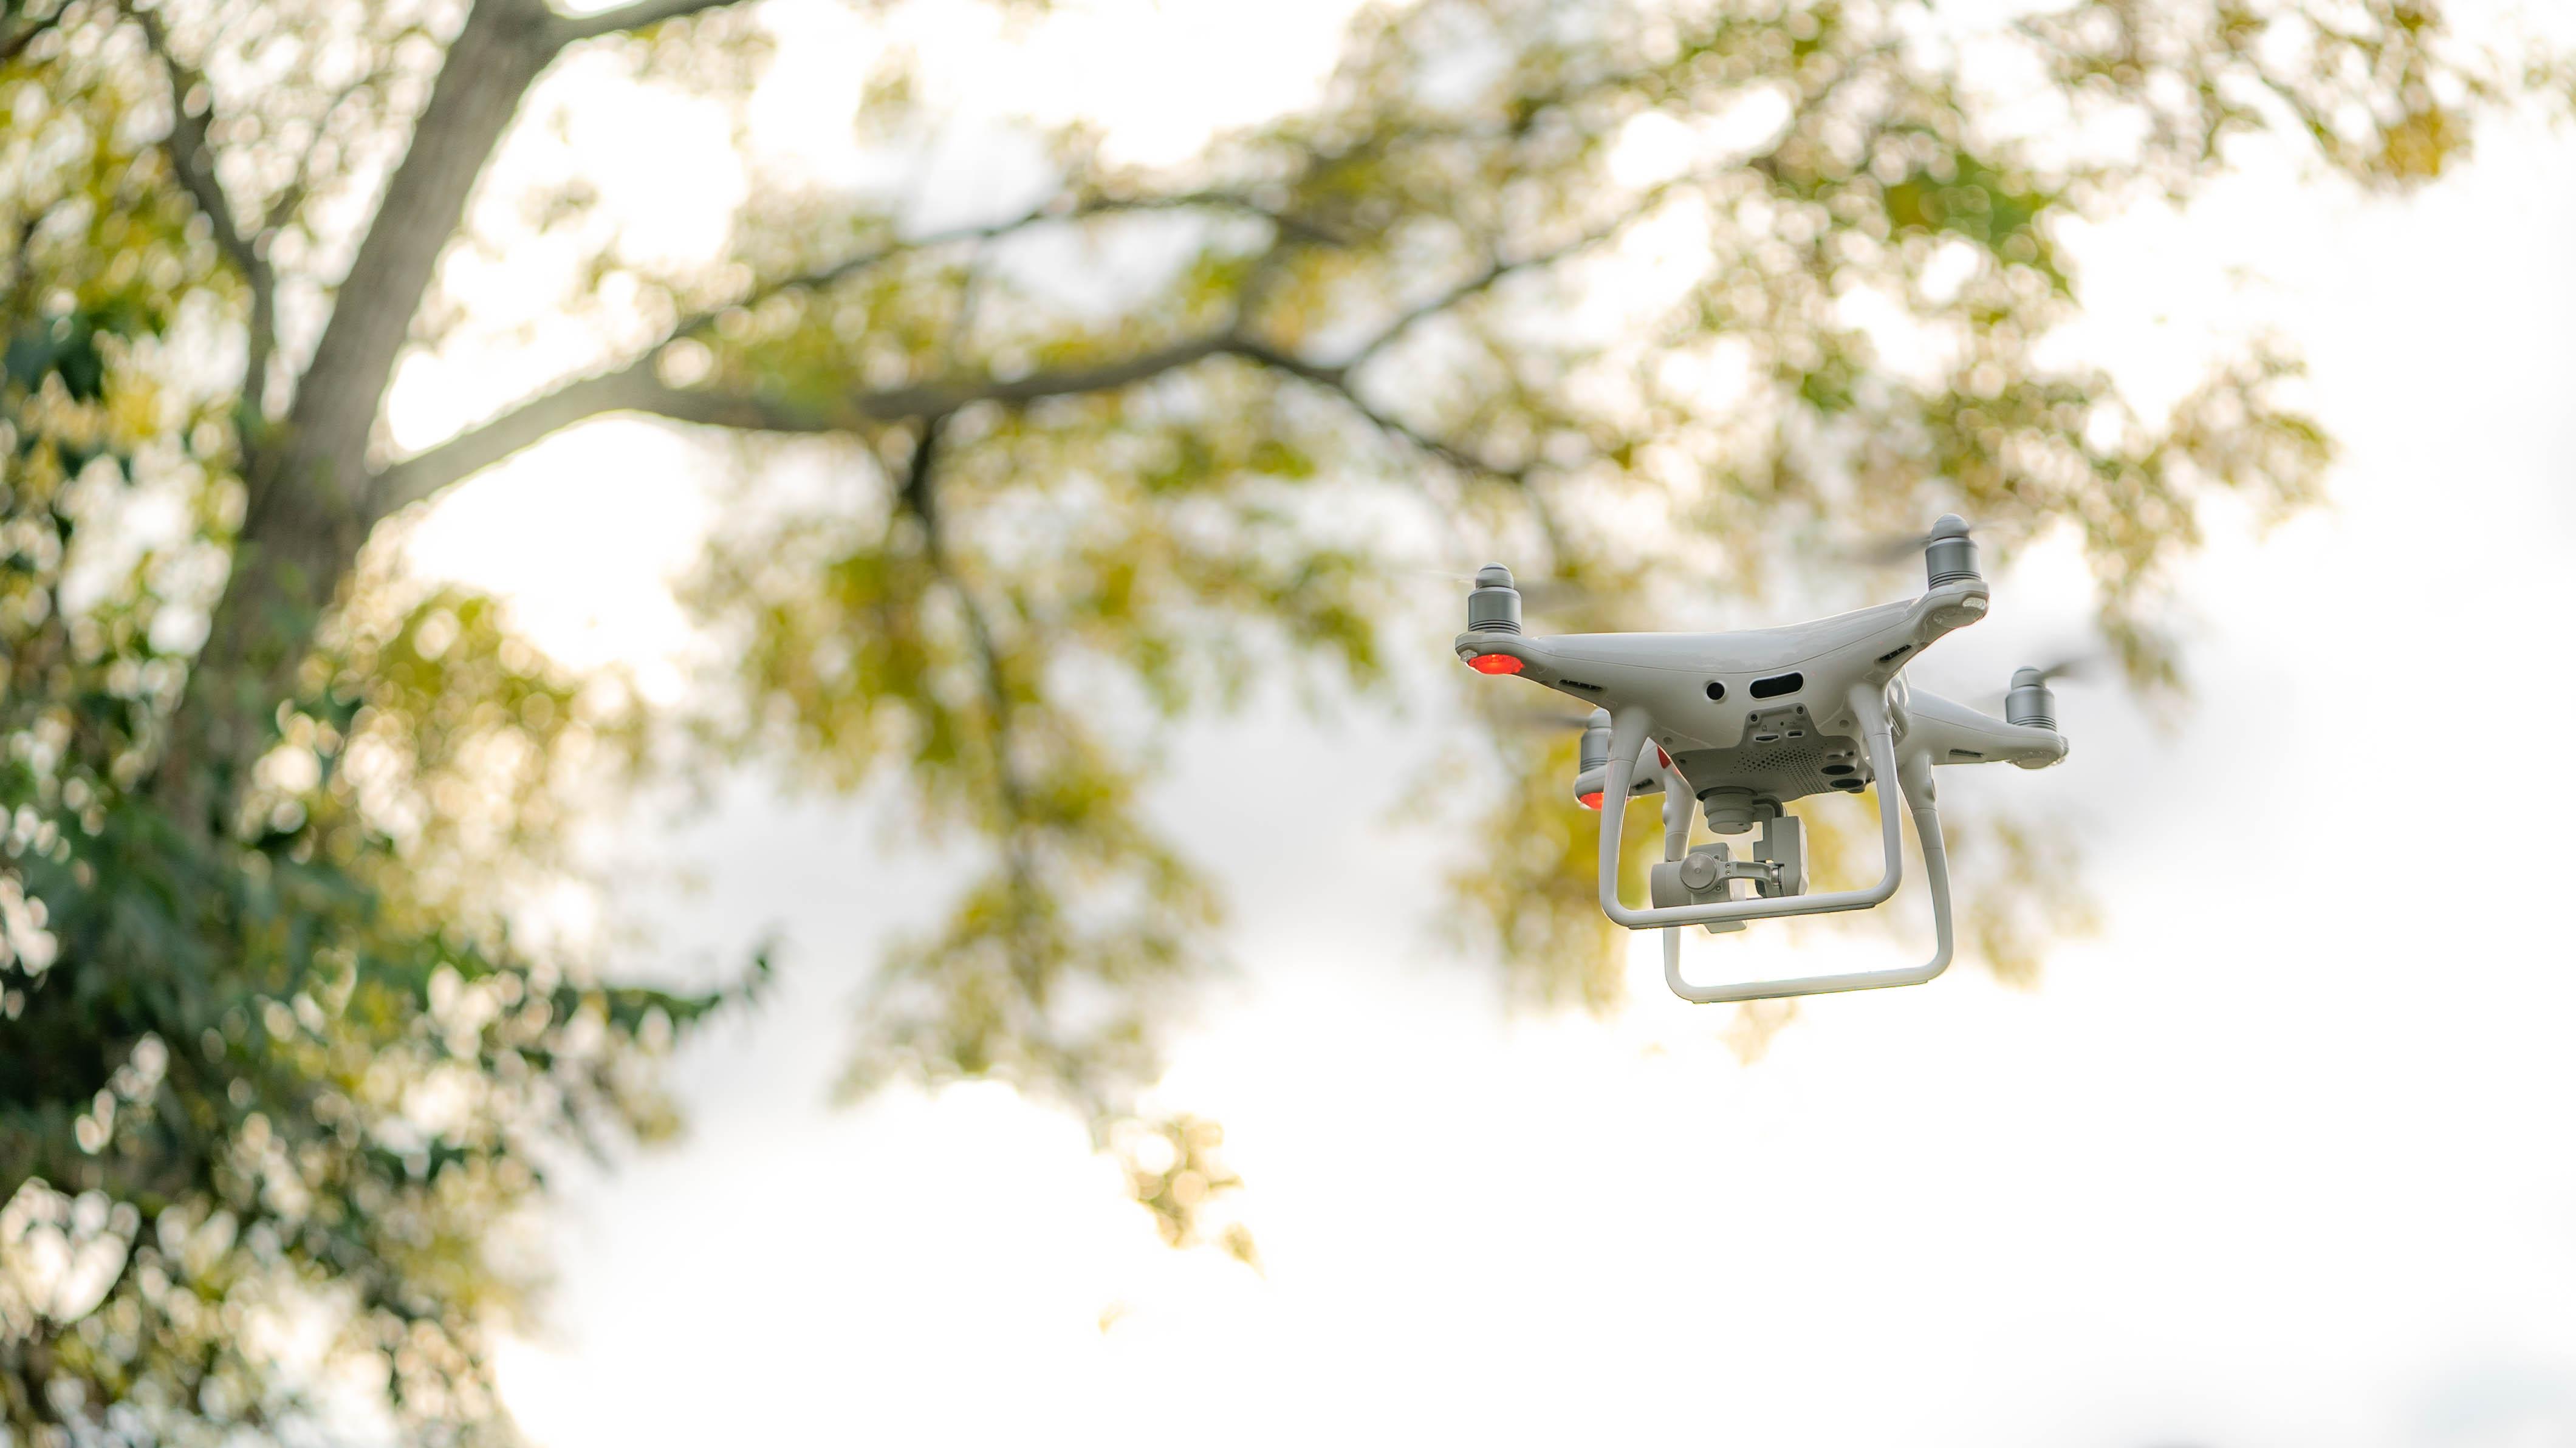 Drone in Tripod Mode